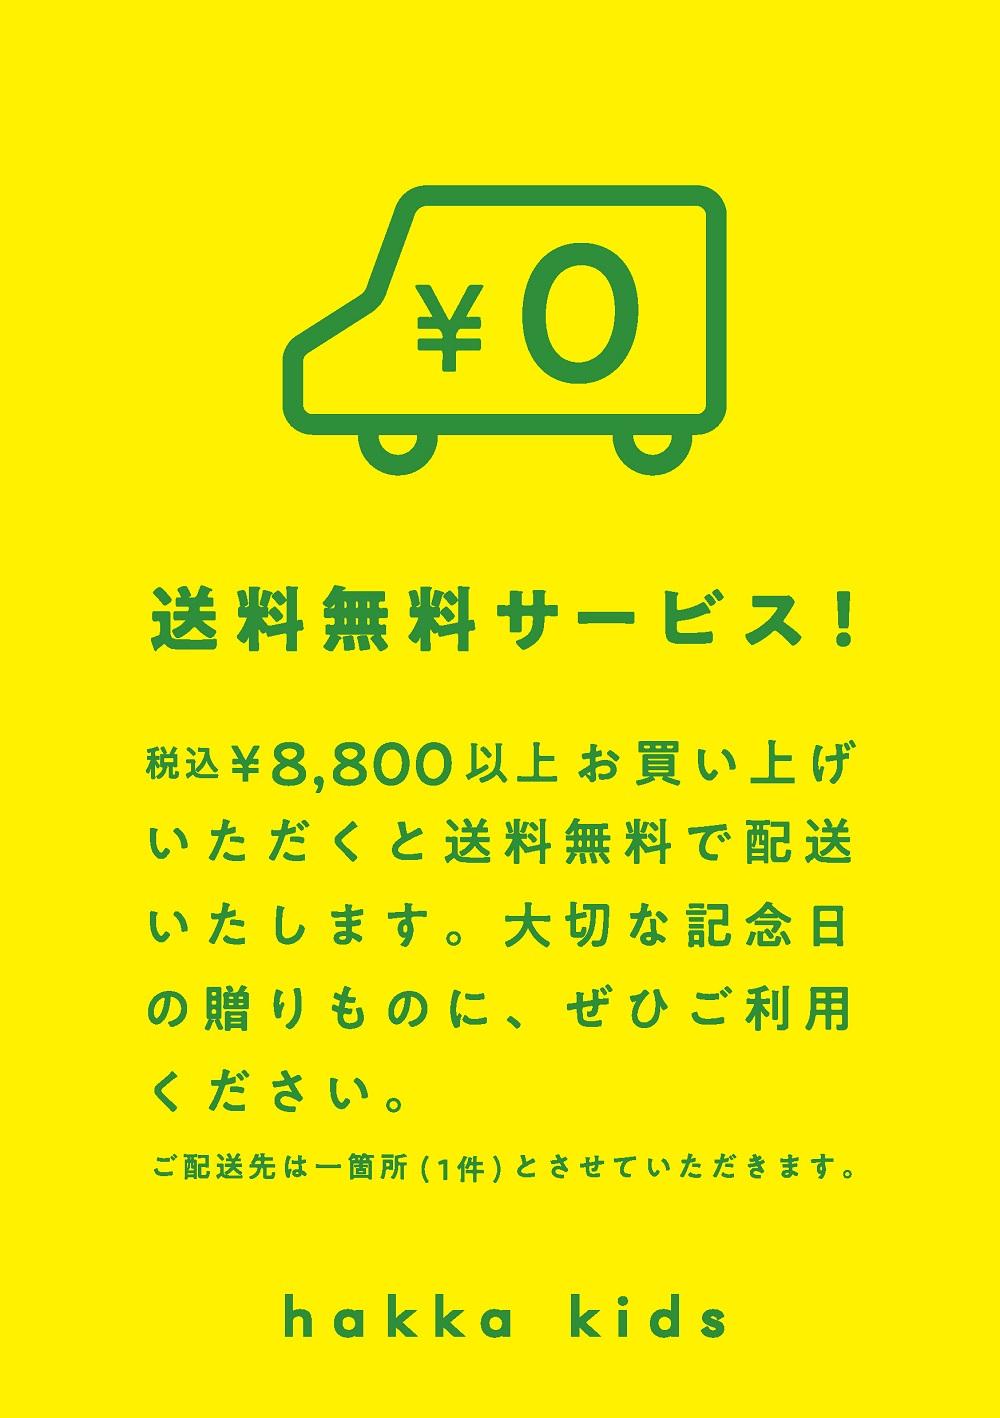 A5_soryo_muryo_pop_fix_ol 2